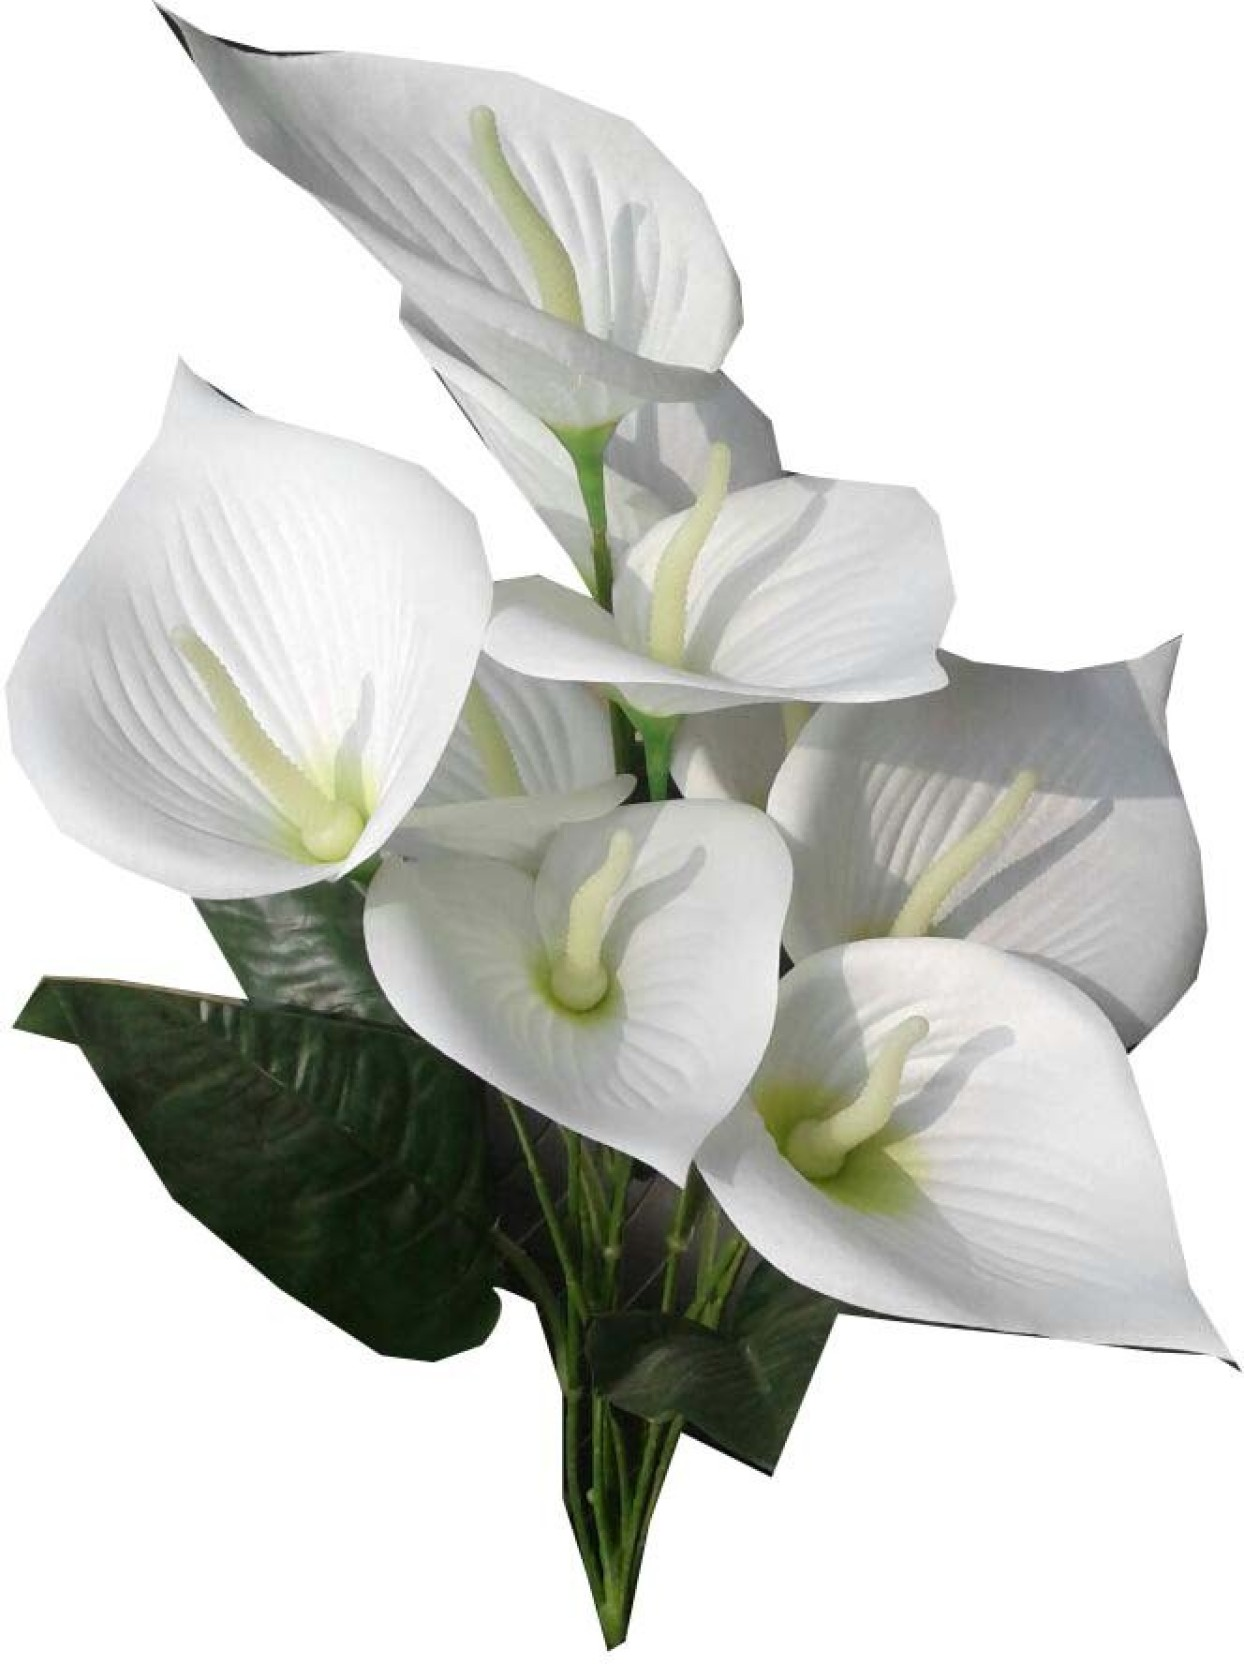 Kaykon Beautiful White Anthurium Flower Bunch For Home Decor Office